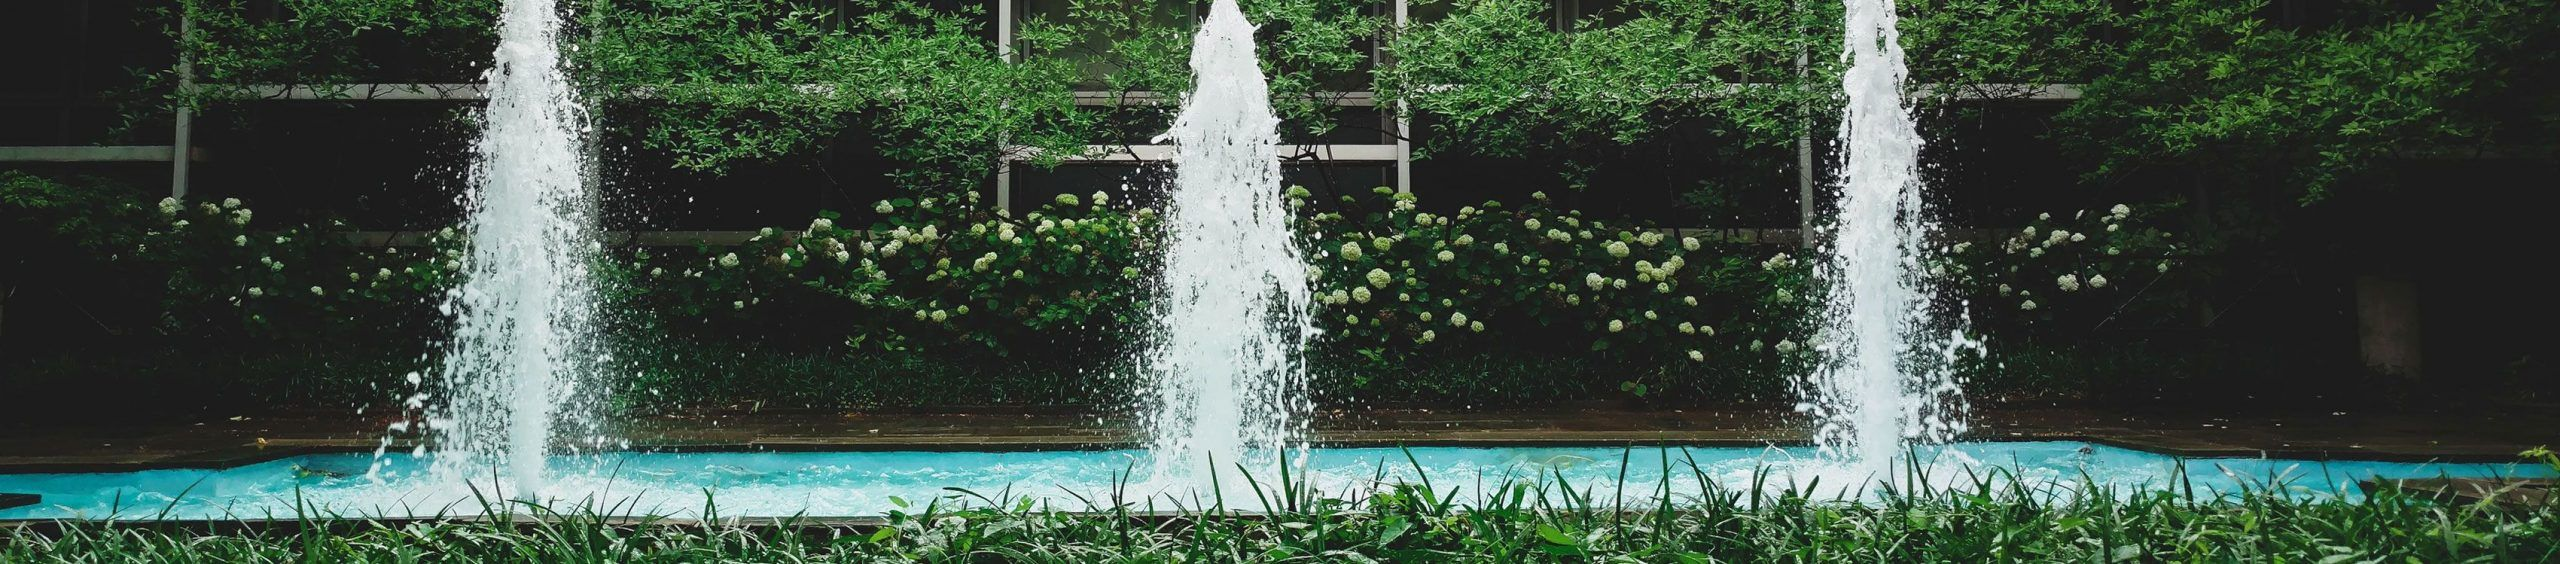 landscaper-water-feature-hero-background